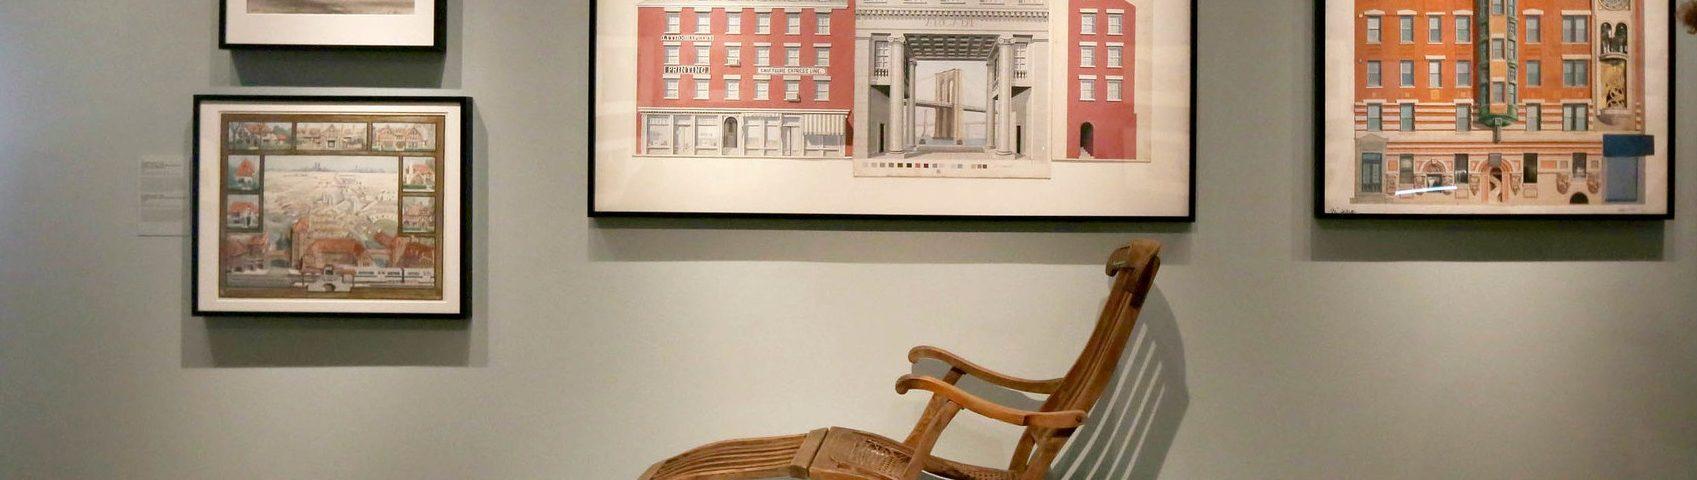 Chaise-longue-titanic